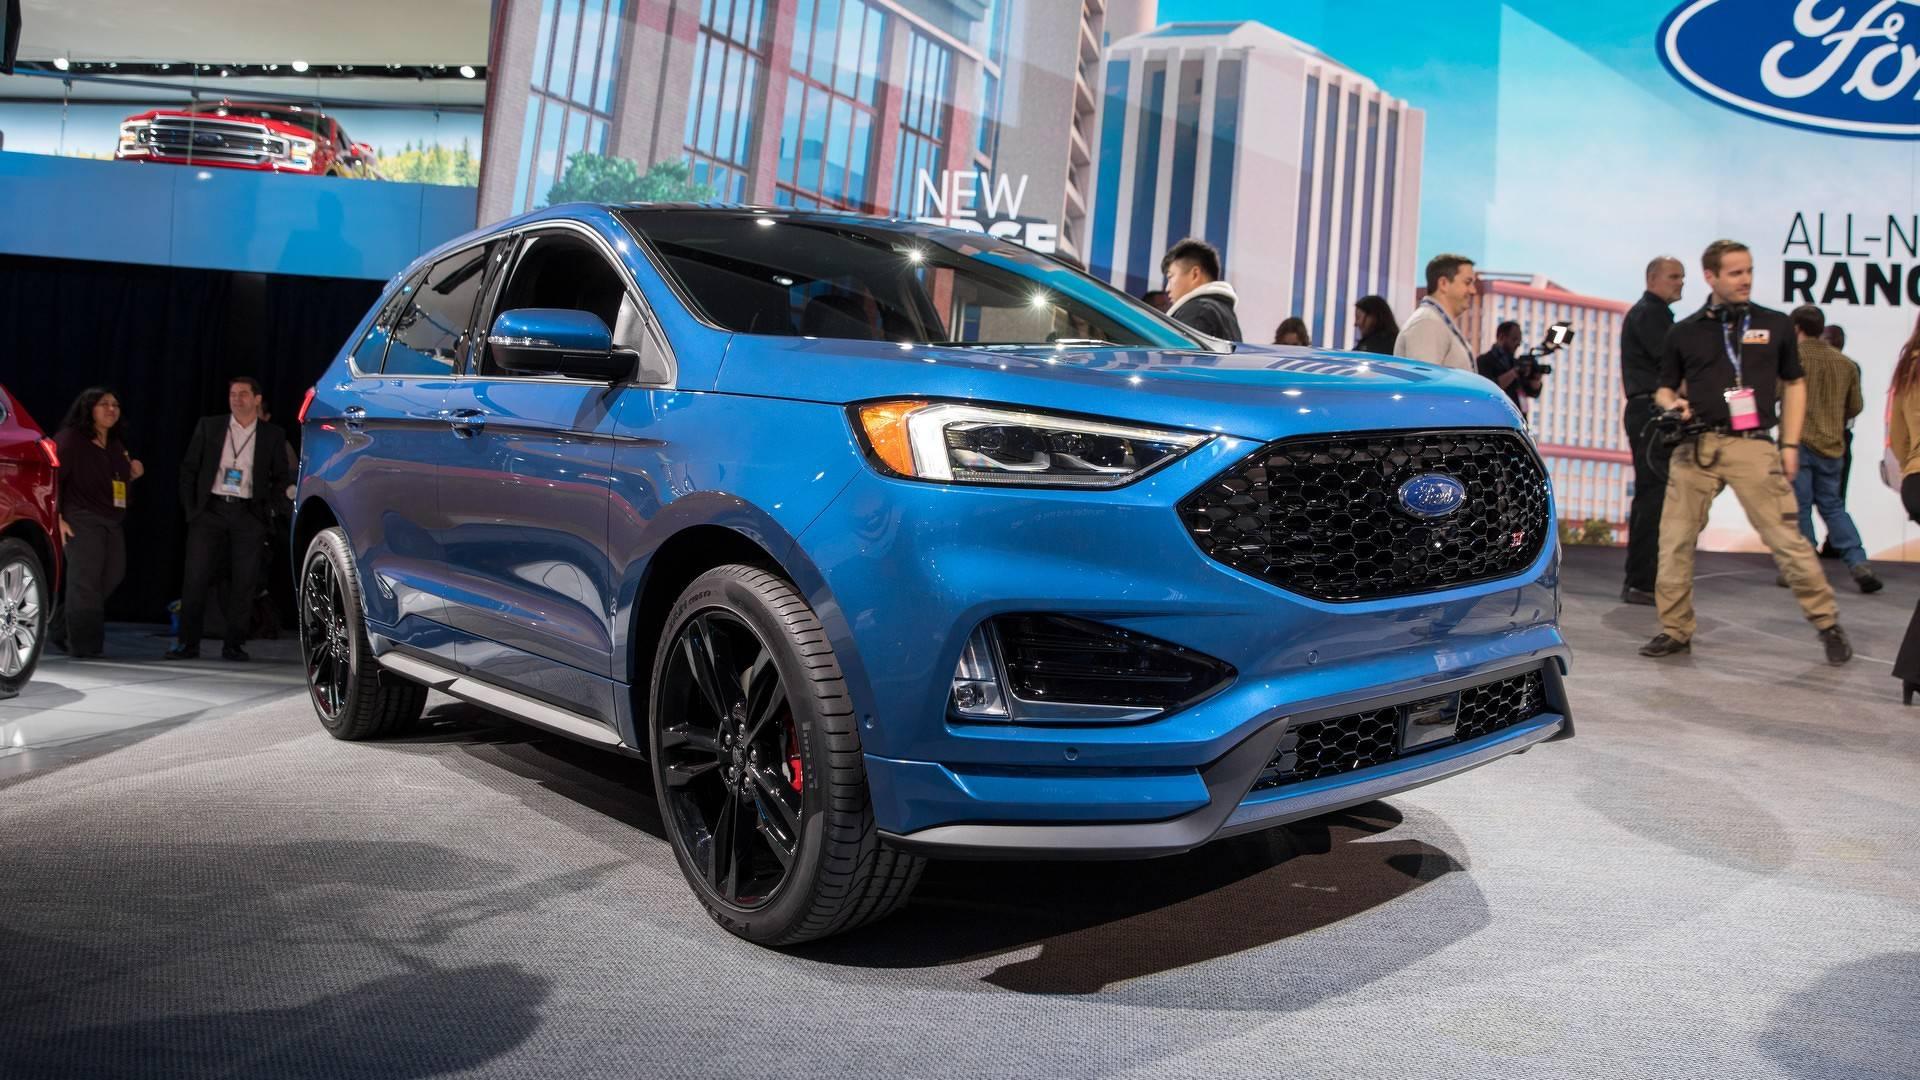 Ford Edge St Gets Even Edgier With Sport Mode Rev Matching Rh Motor Com